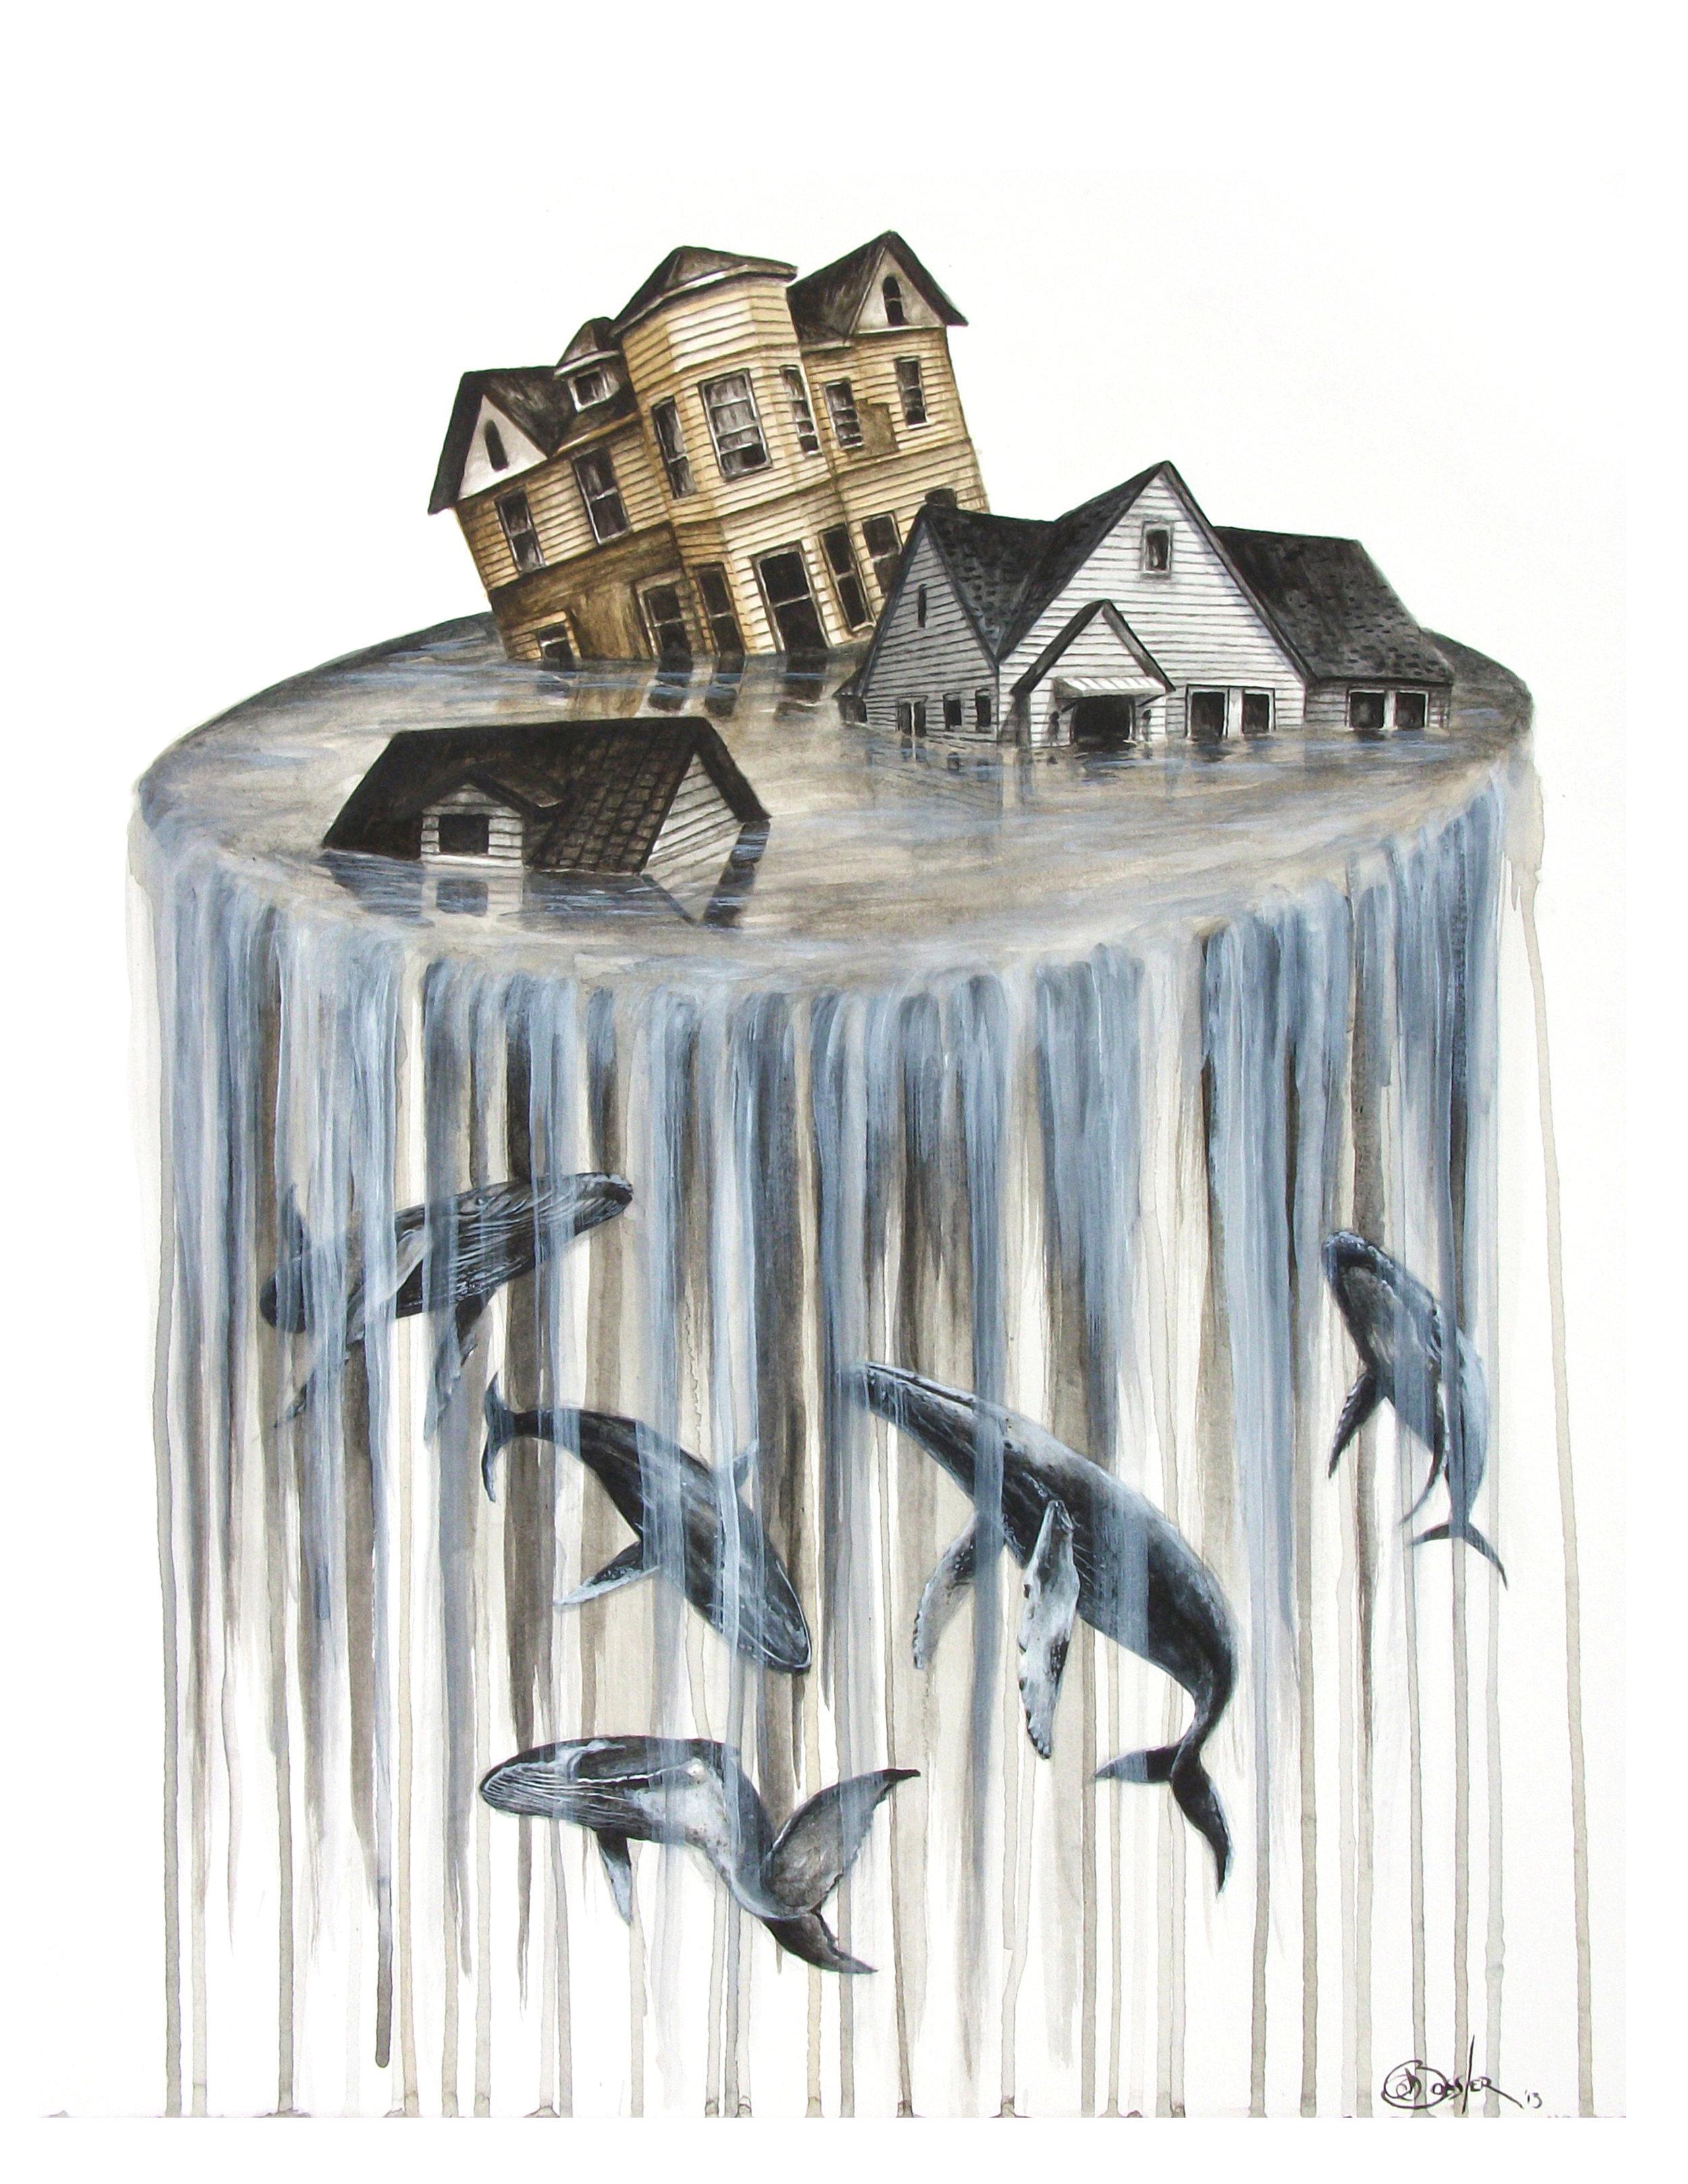 The Flood III